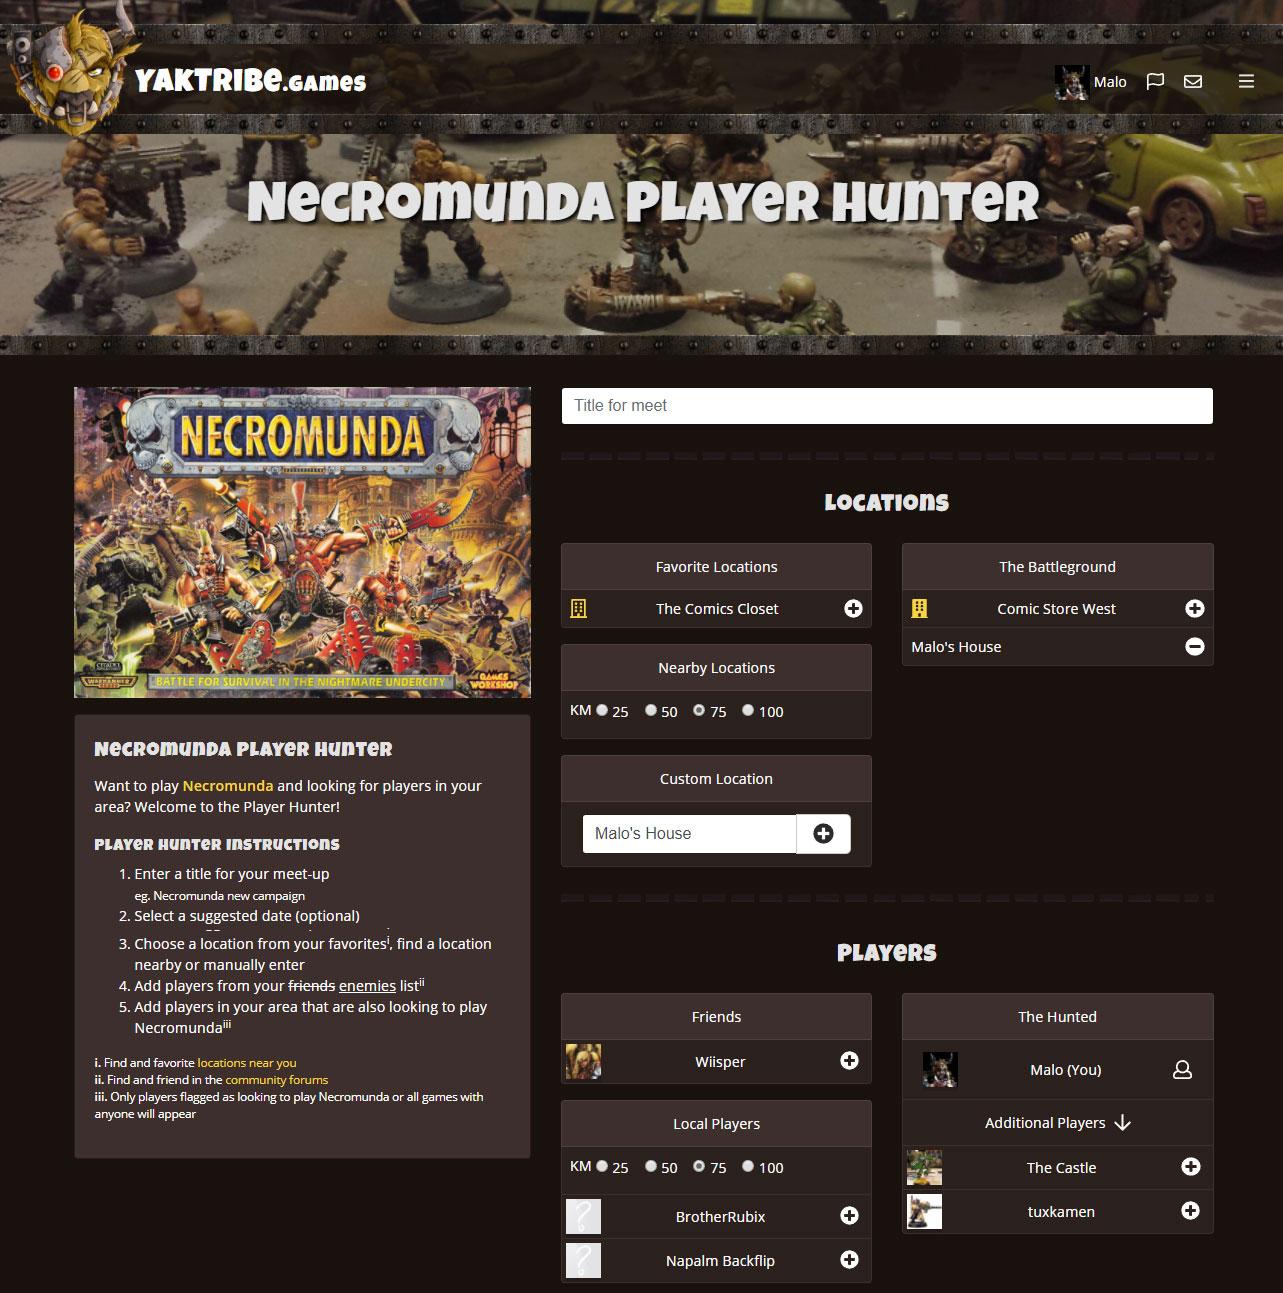 playerhunter2.jpg